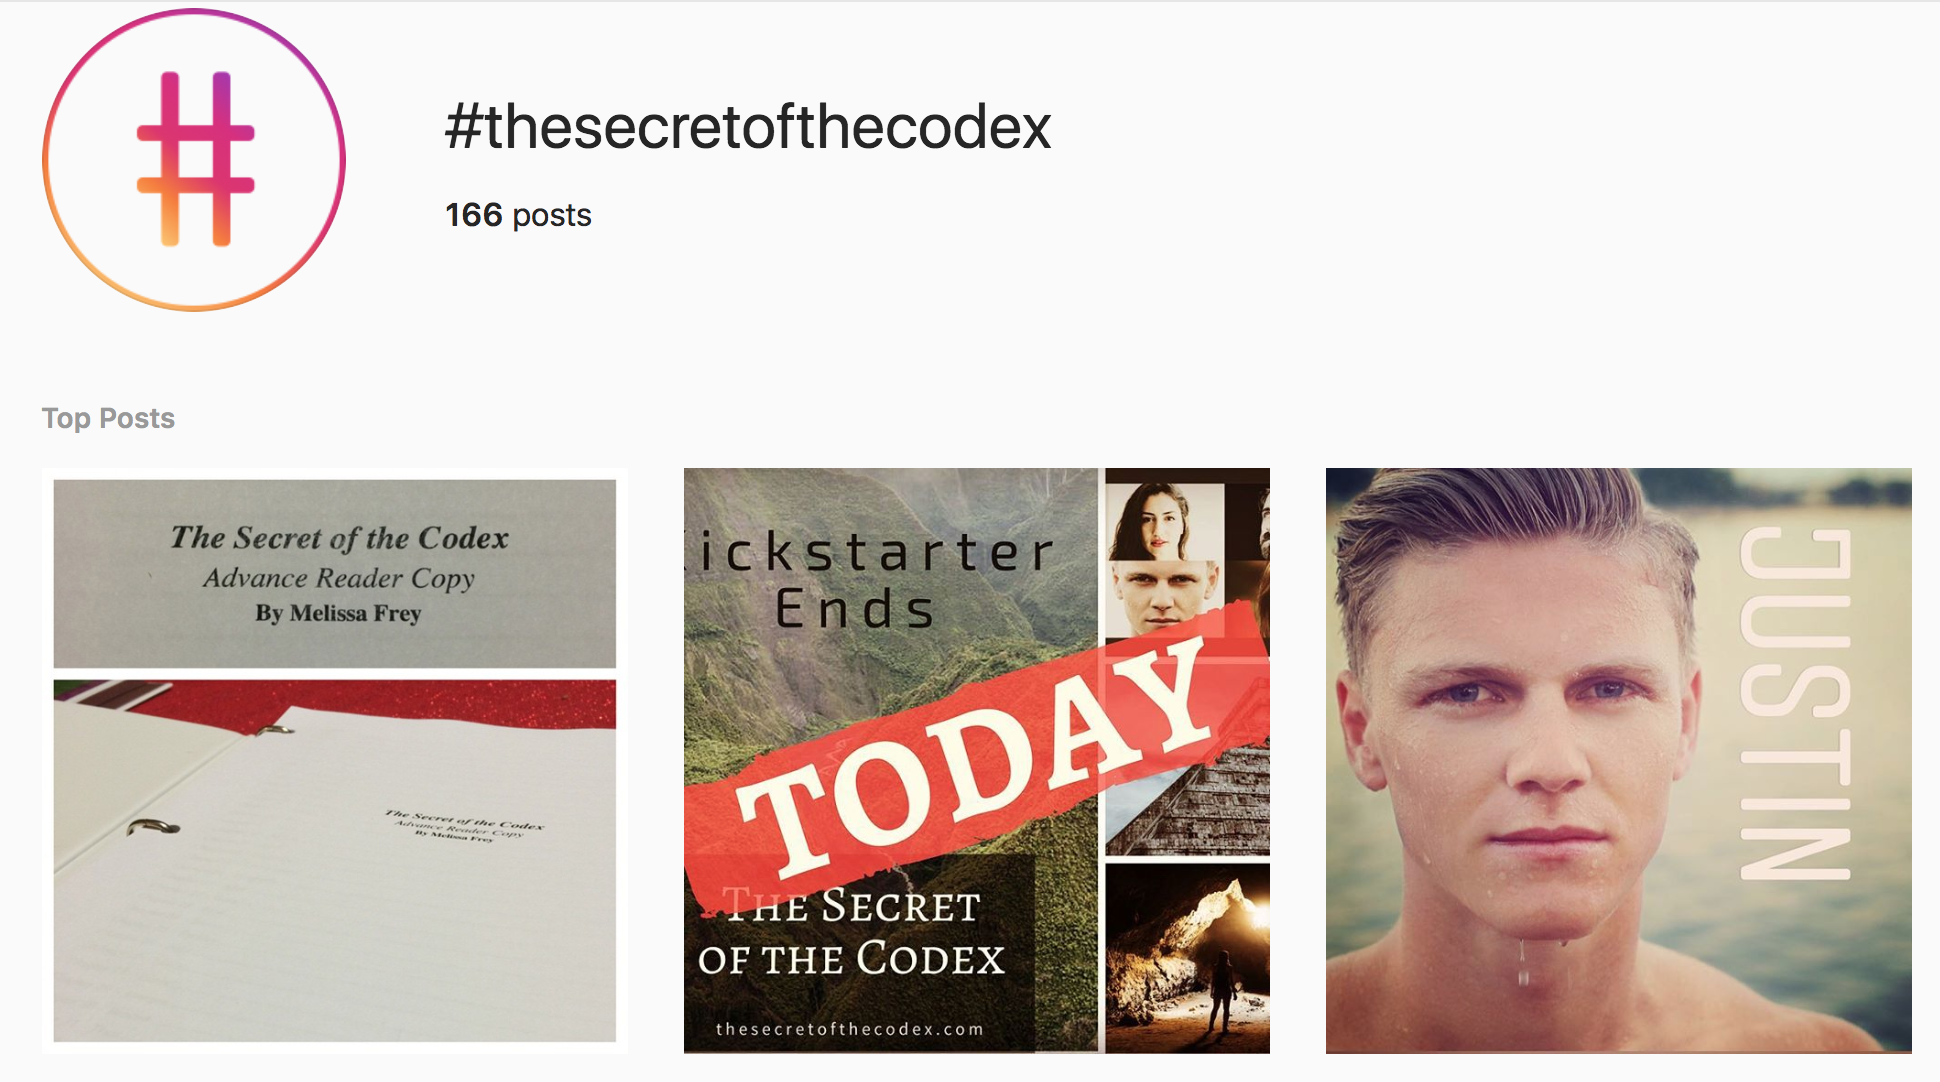 https://www.instagram.com/explore/tags/thesecretofthecodex/